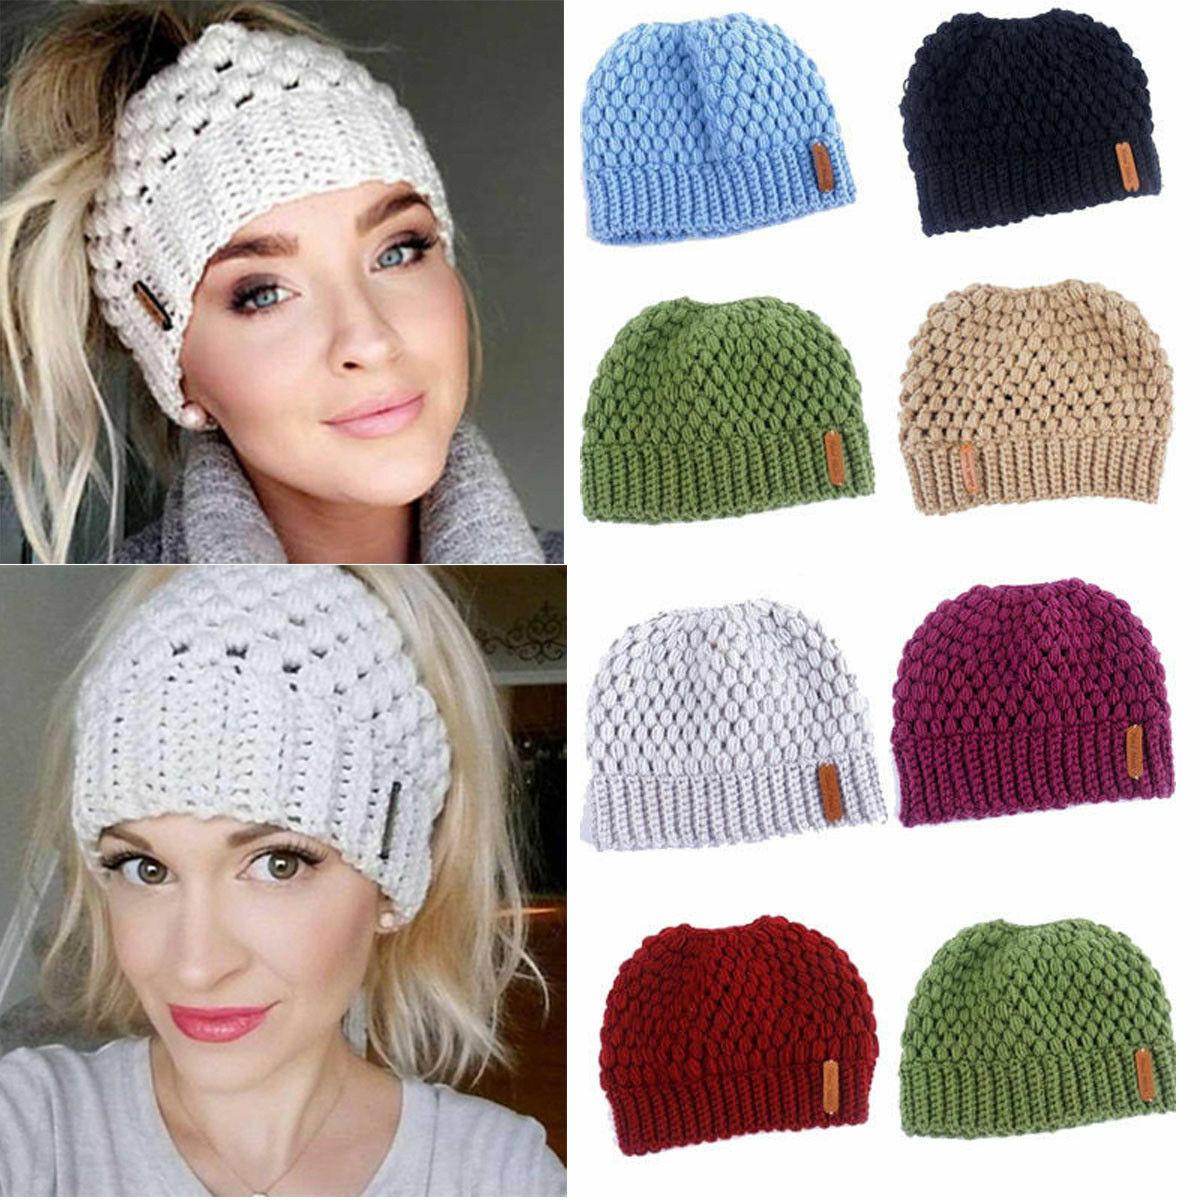 Зимние вязаные шапки, зимние женские шапки, тянущиеся вязаные шапки с этикеткой, грязная булочка, хвостик, шапка, теплые шапки